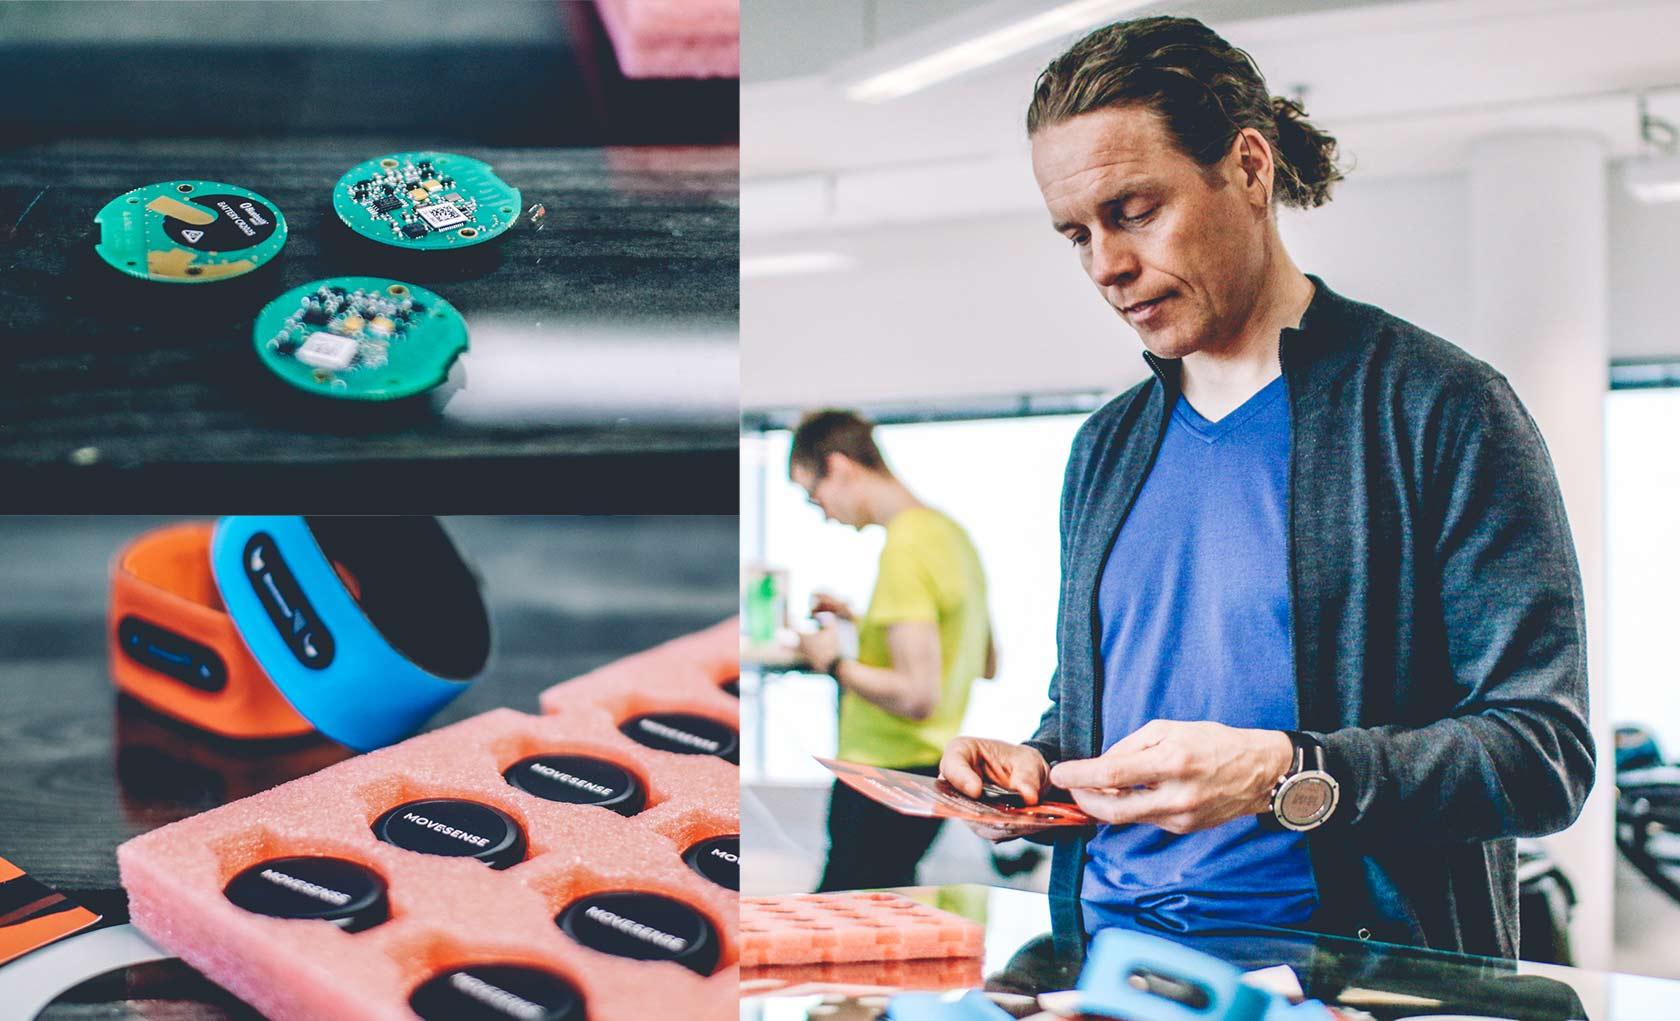 Terho Lahtinen from Suunto shows Movesense sensor prototypes